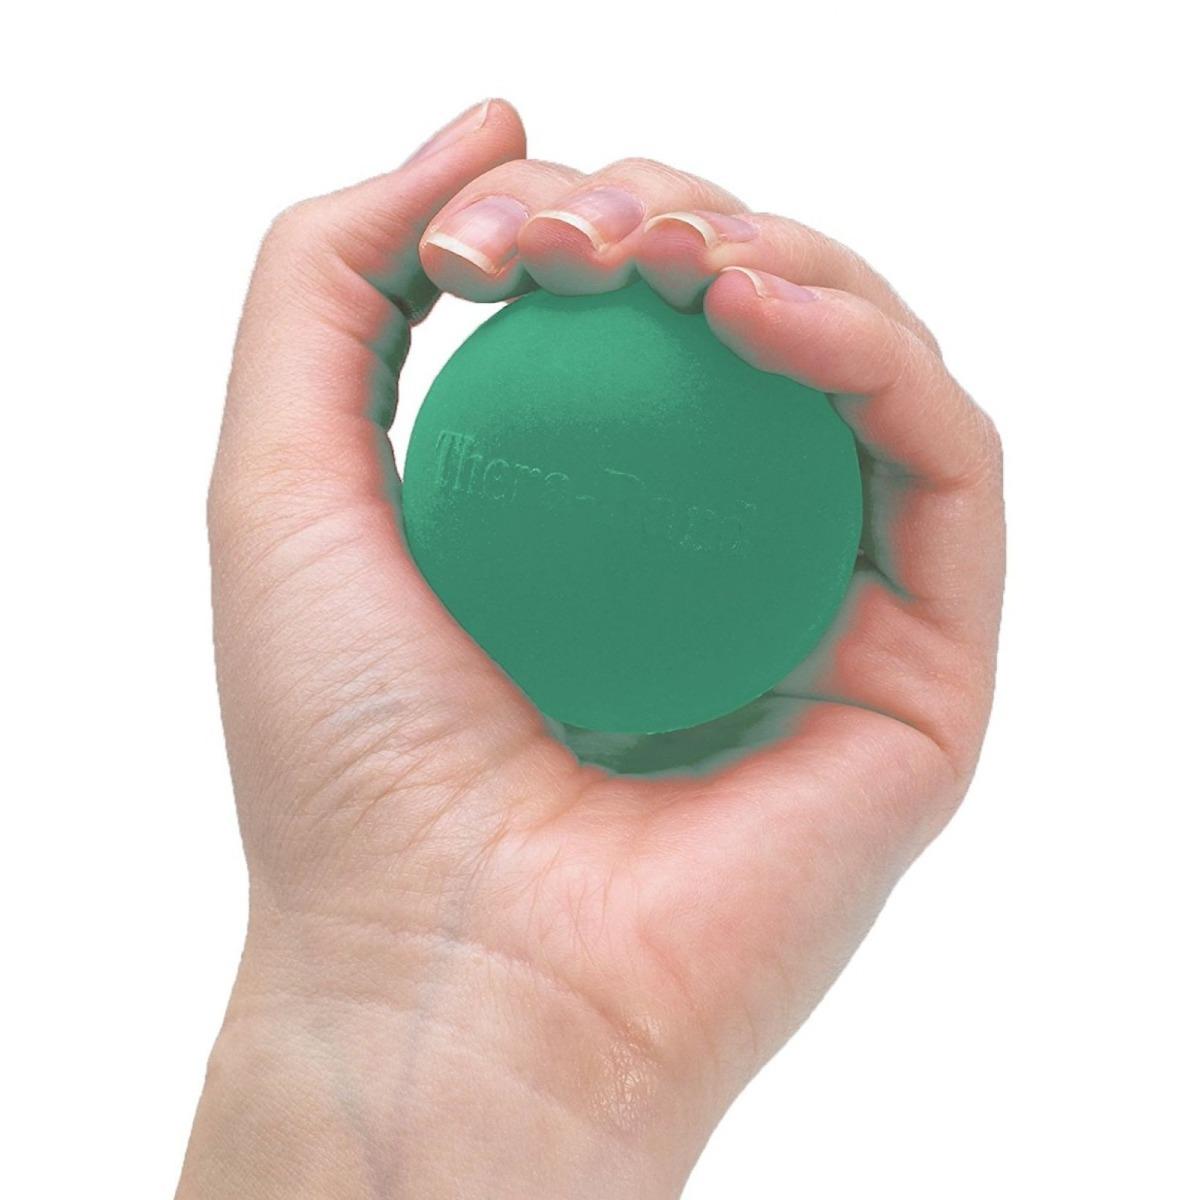 TheraBand Hand Exerciser, Level 3, Green, Medium